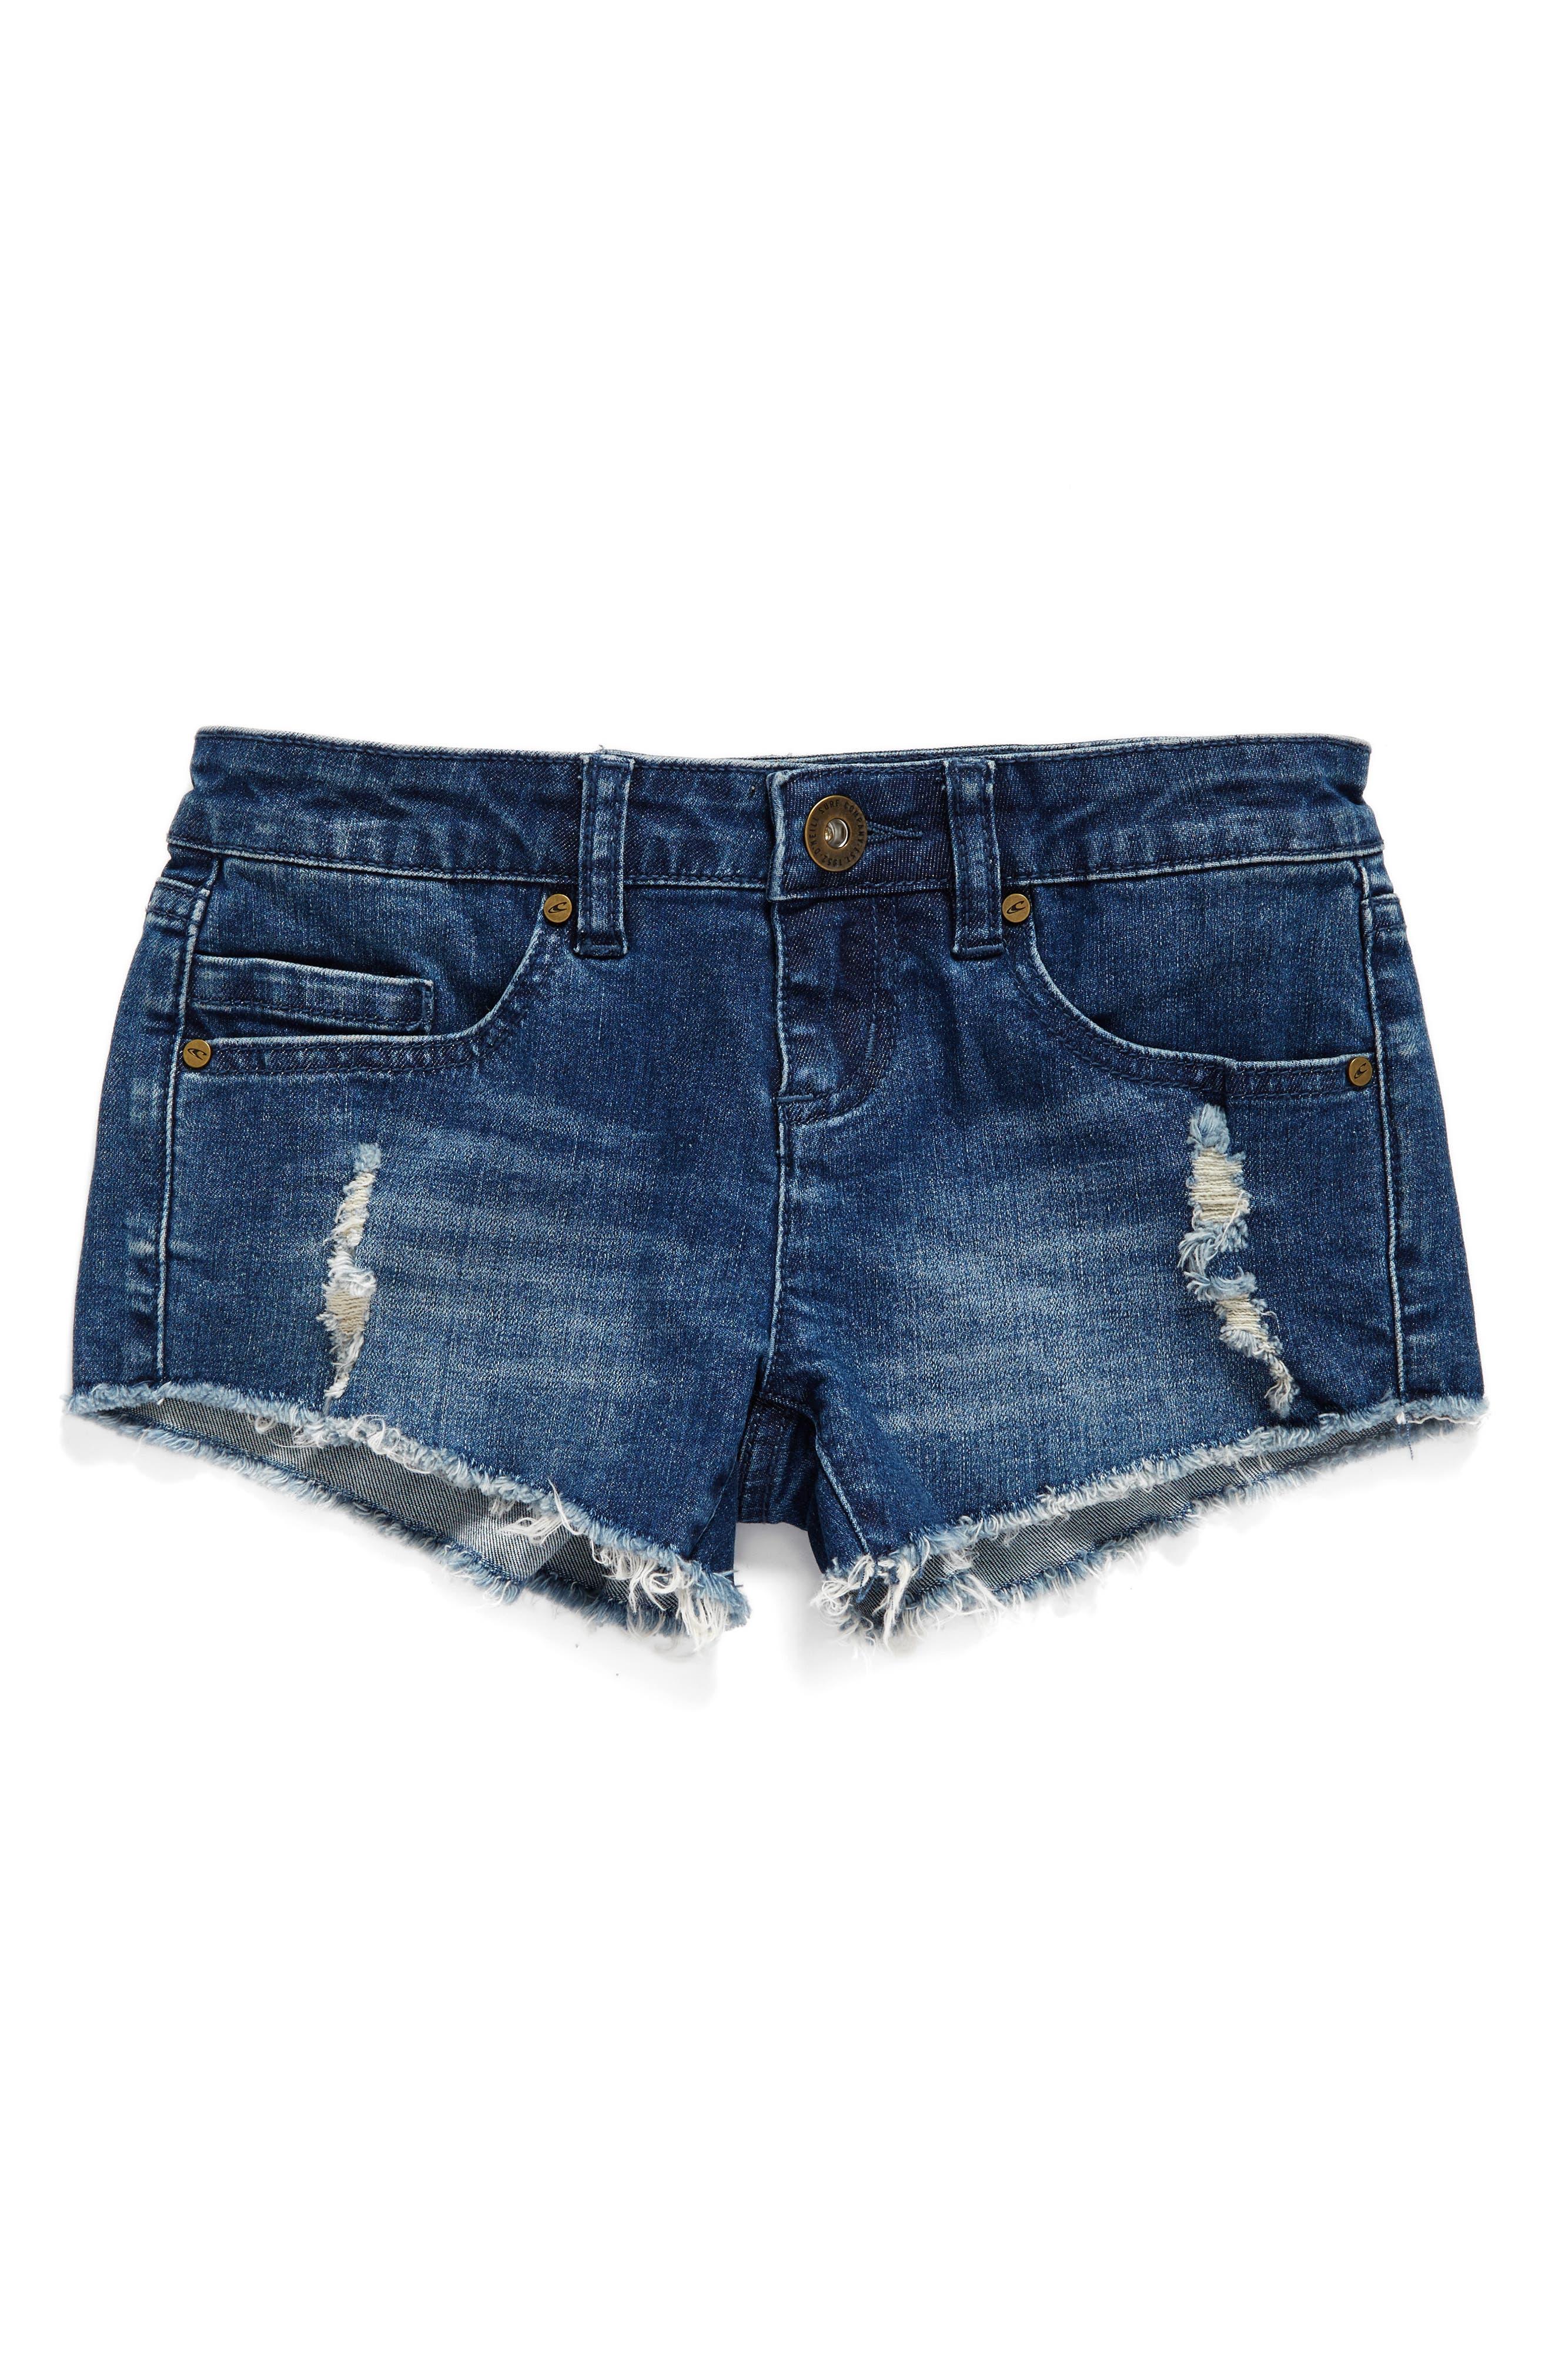 Camper Denim Shorts,                             Main thumbnail 1, color,                             Blue Grass